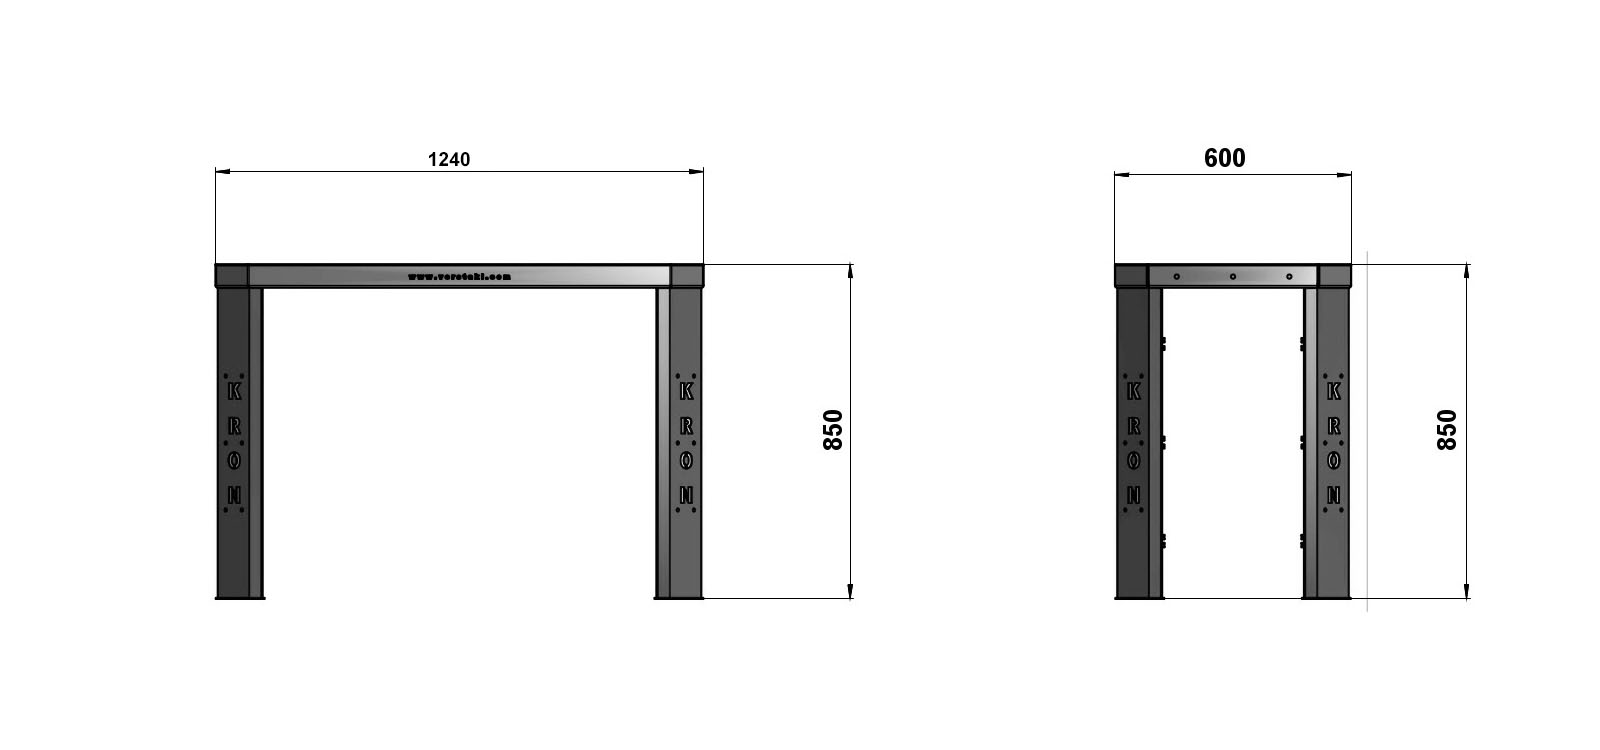 Чертеж слесарного верстака шириной 1240 мм без экрана